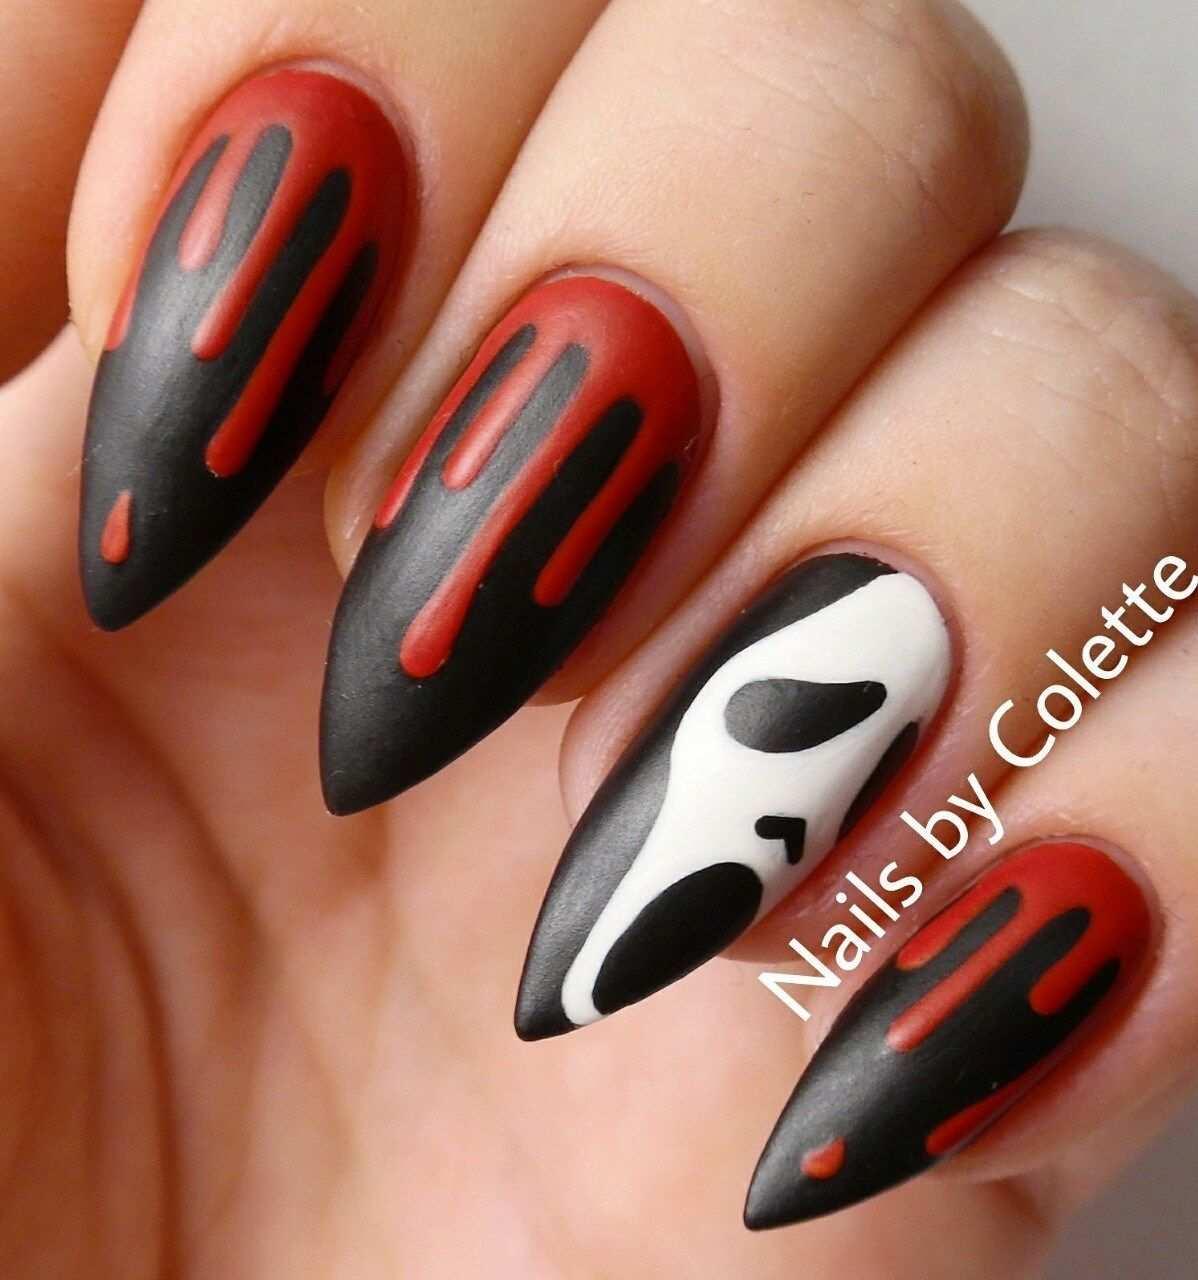 Great Nail Art Idea For Halloween Halloween Nails Diy Cute Halloween Nails Halloween Nail Designs